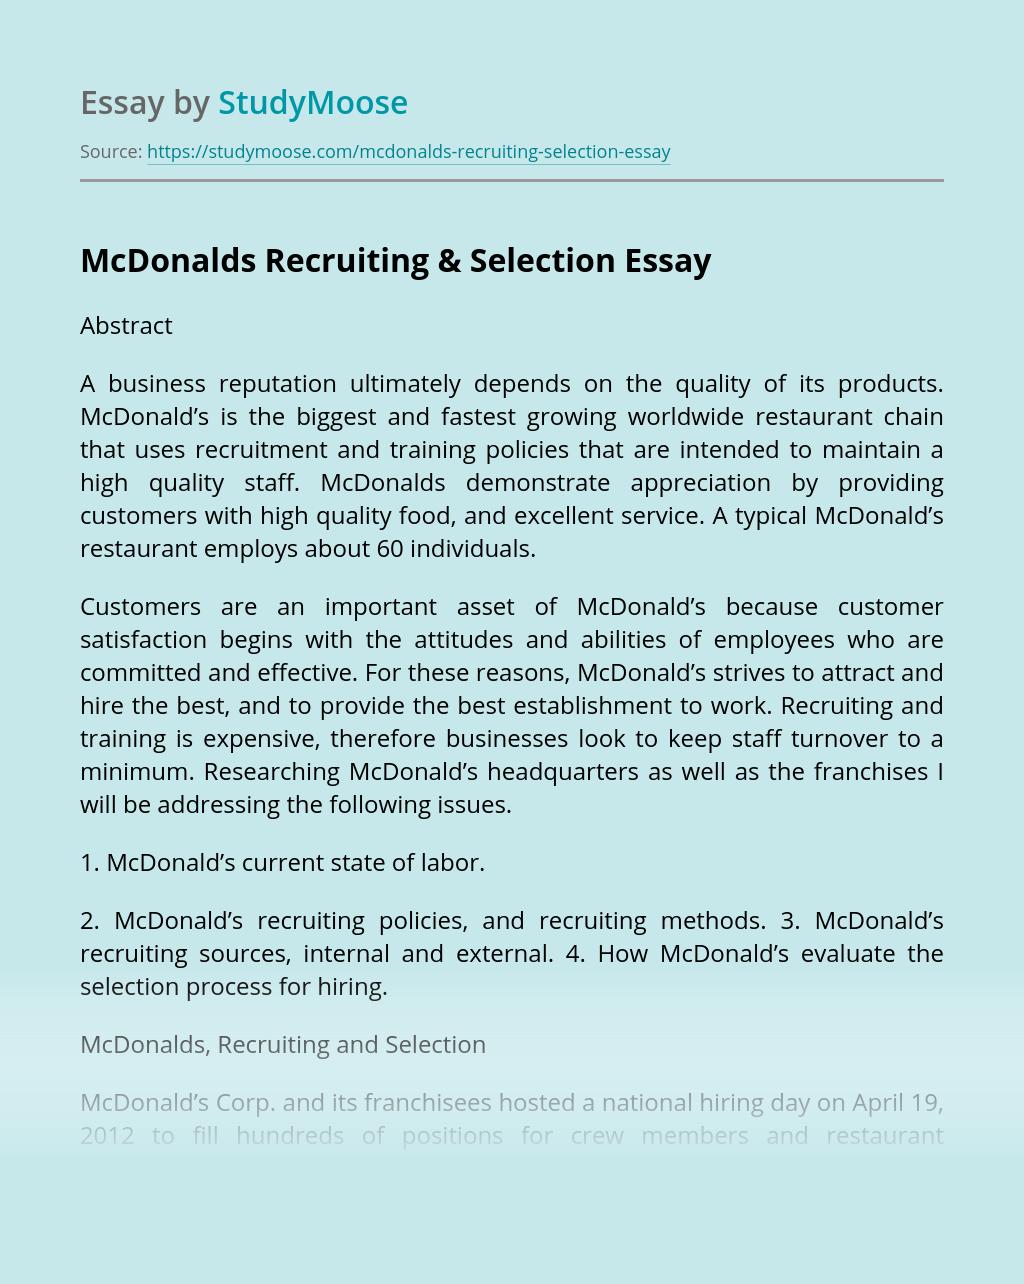 McDonalds Recruiting & Selection